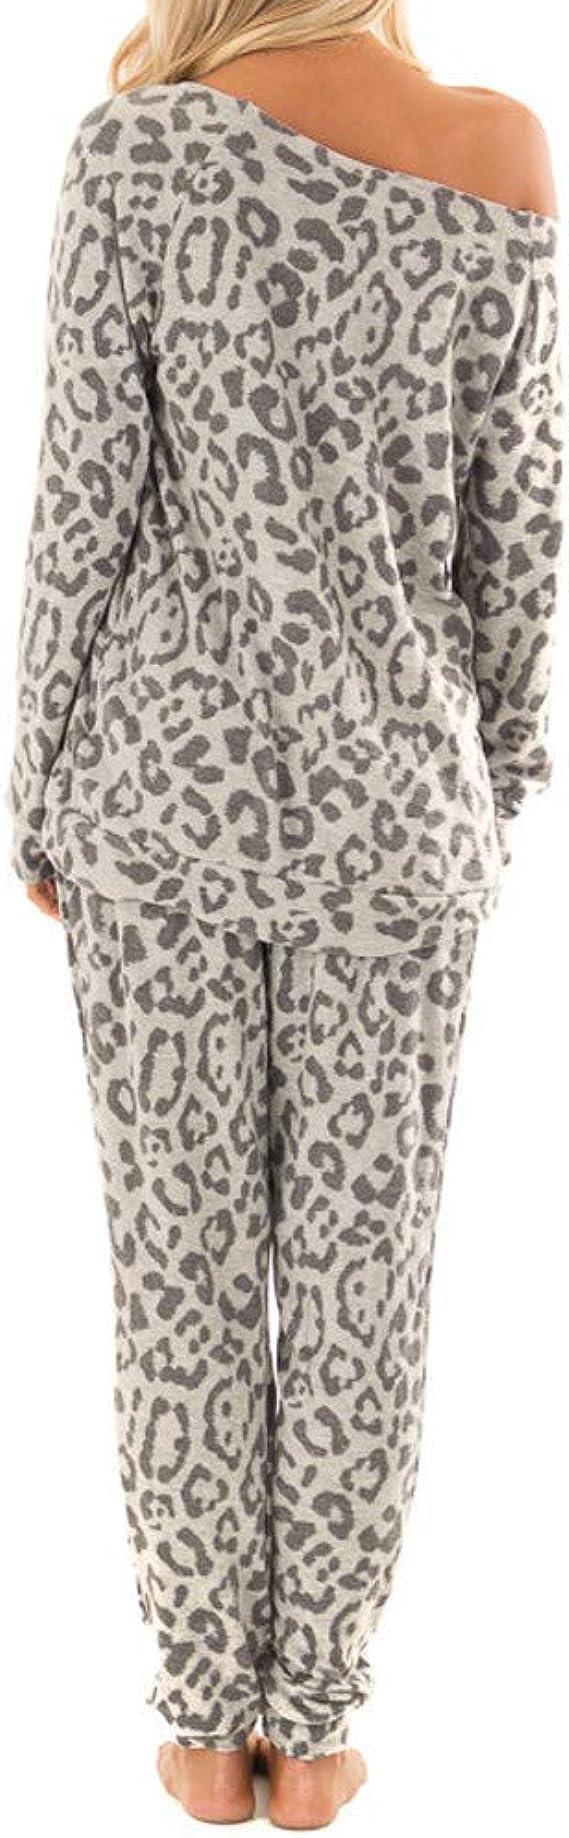 Damen Trainingsanzug Hoodie Sweatjacke Hose Leopard Jogginganzug Sport Fitness